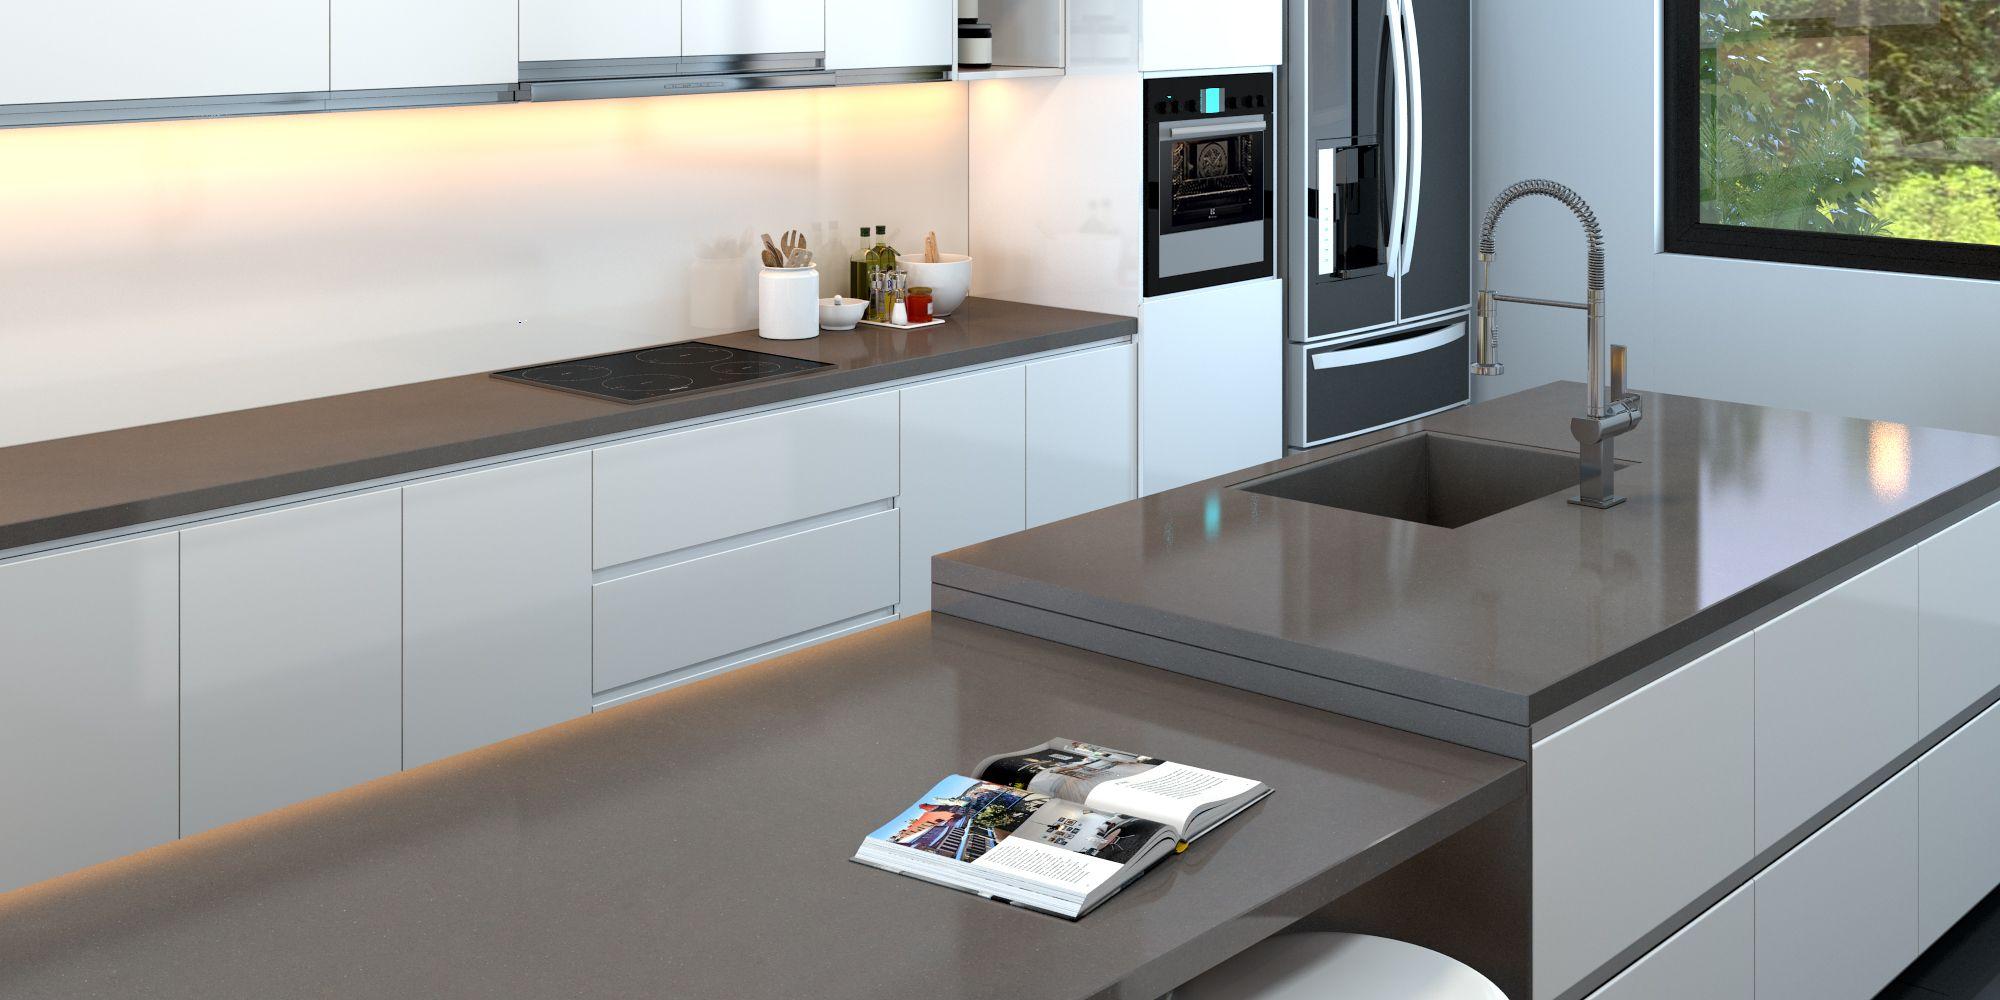 BQ2202 - Sabbianco #Vicostone #Quartz #Countertops #interiordesigns ...